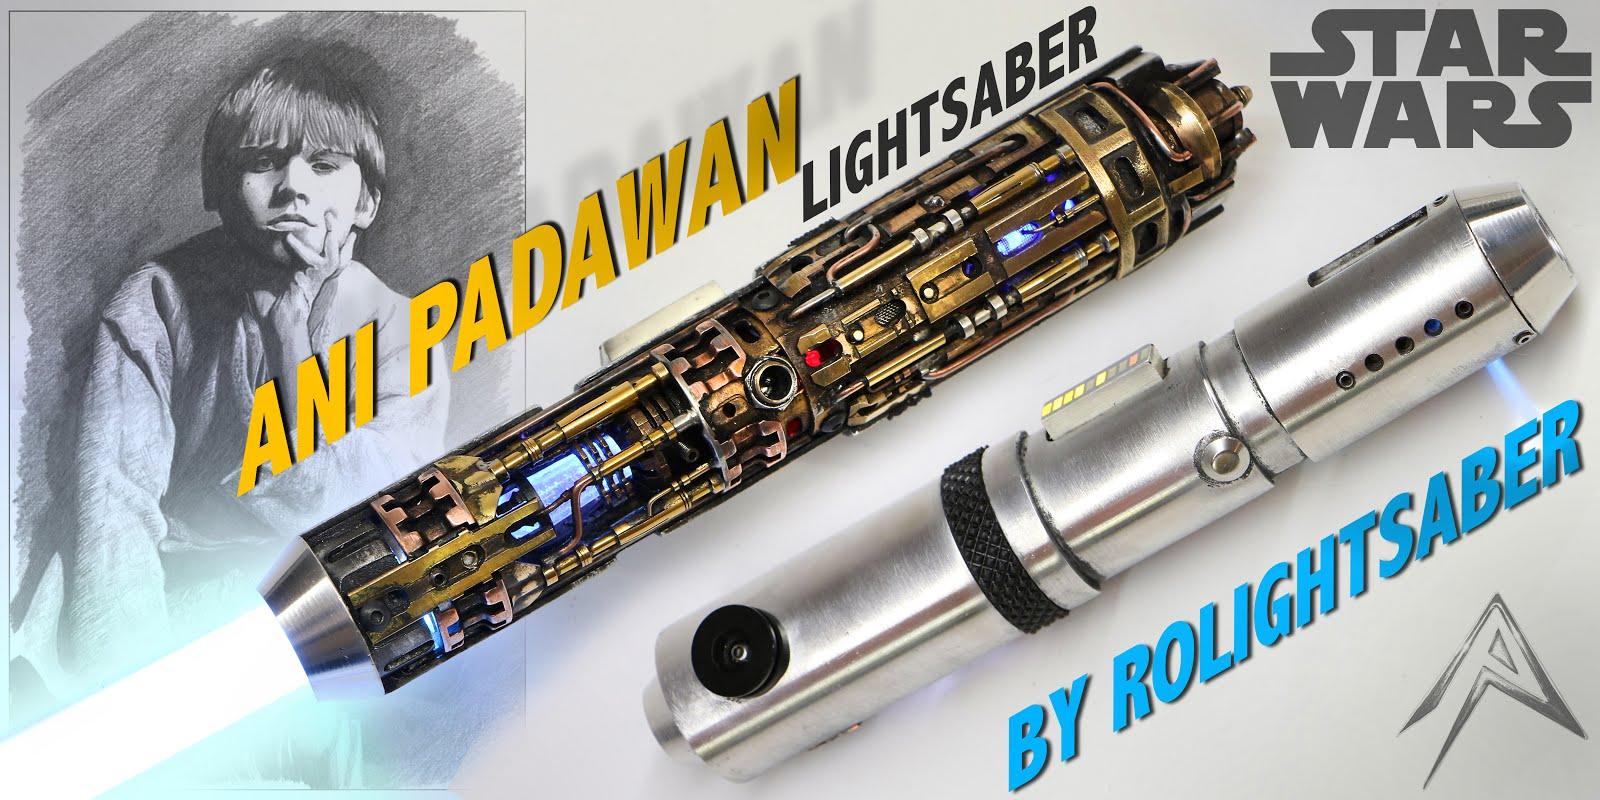 ANI PADAWAN lightsaber Cutaway